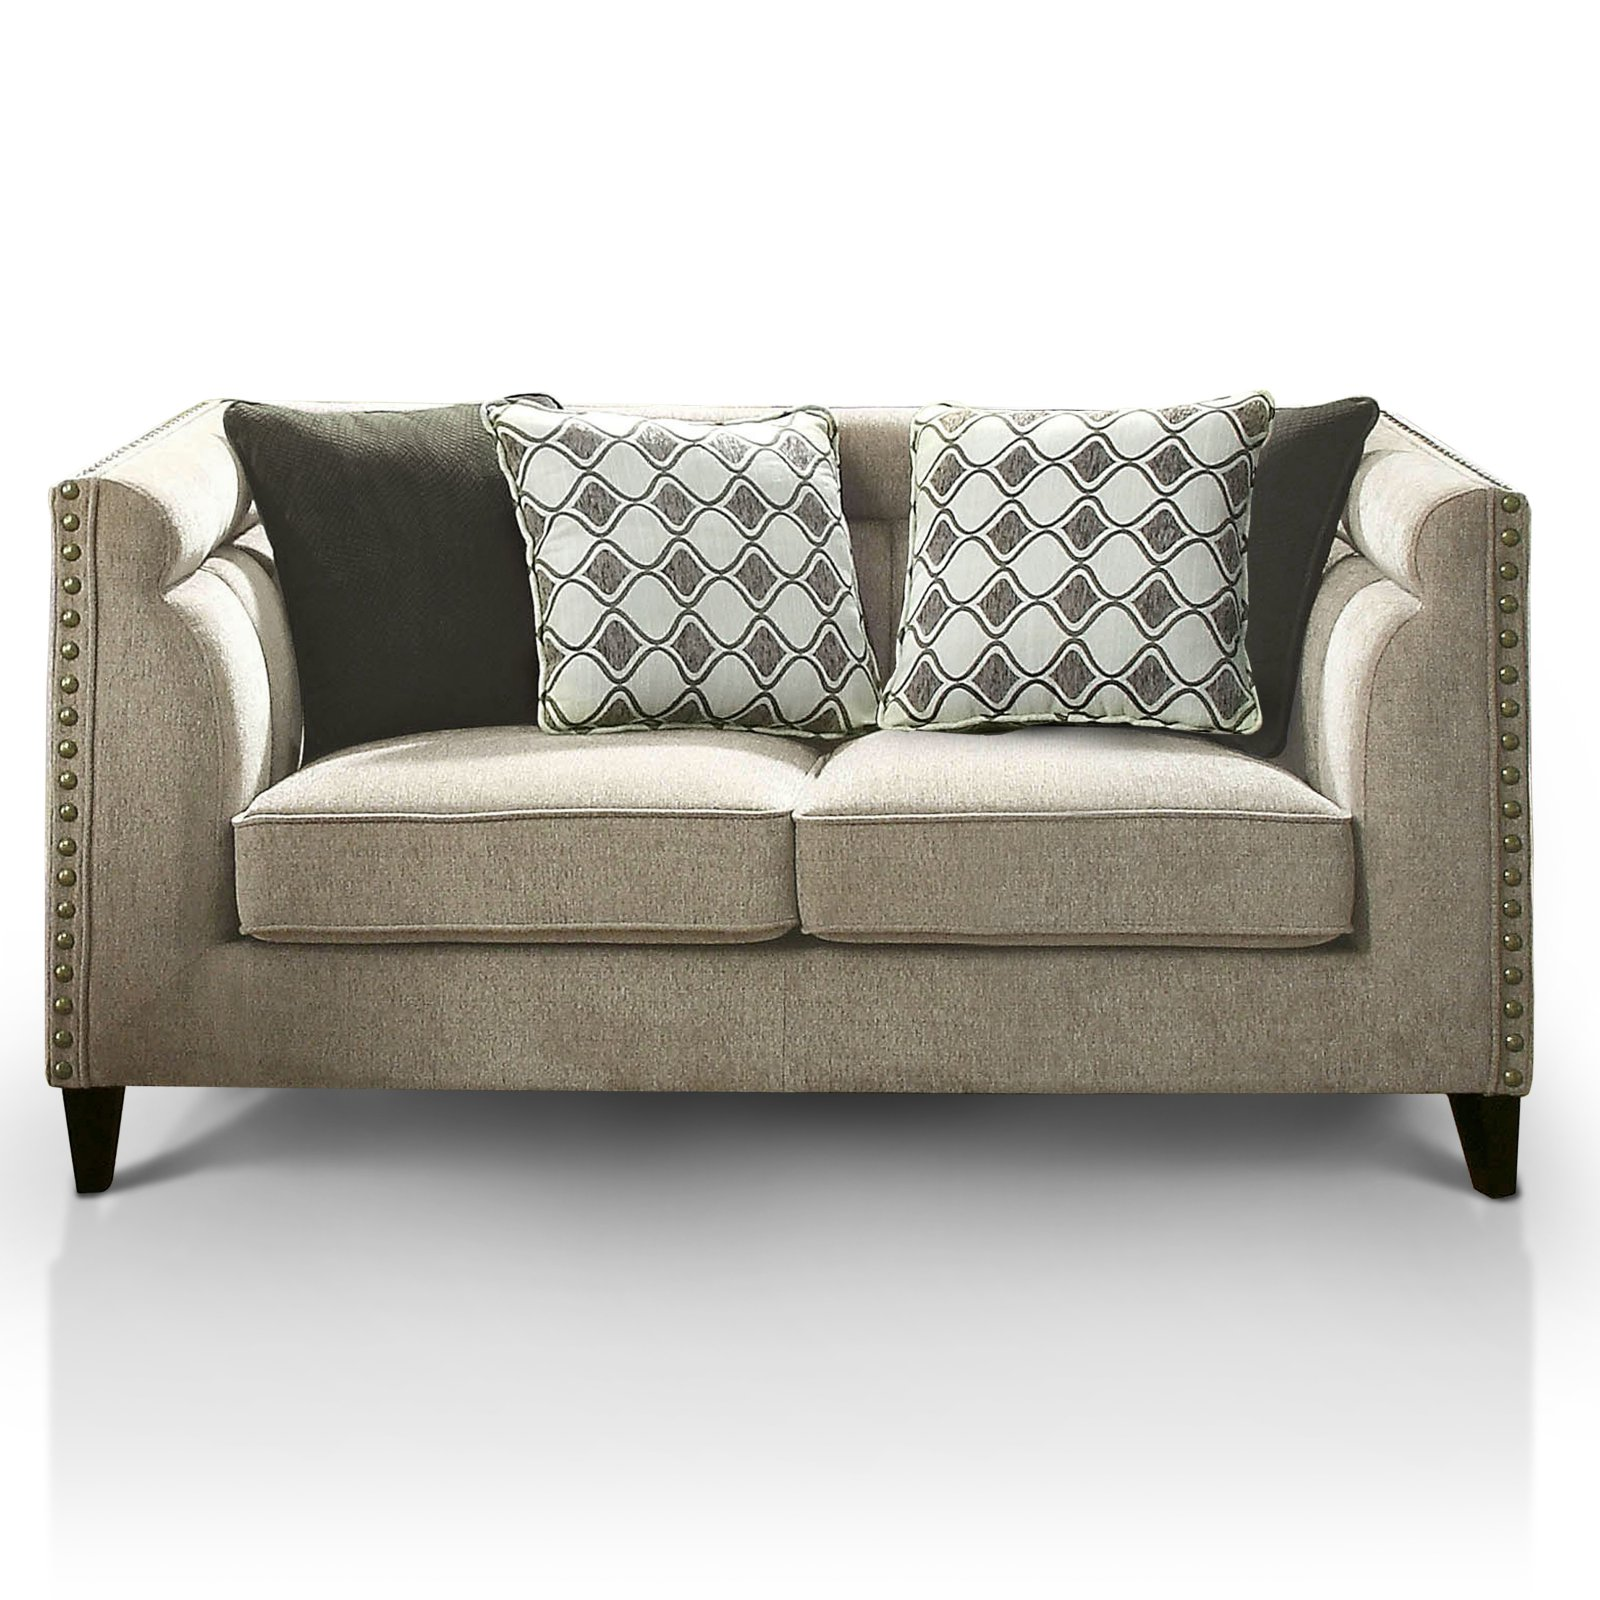 Furniture Of America Eponine Loveseat Love Seat Furniture